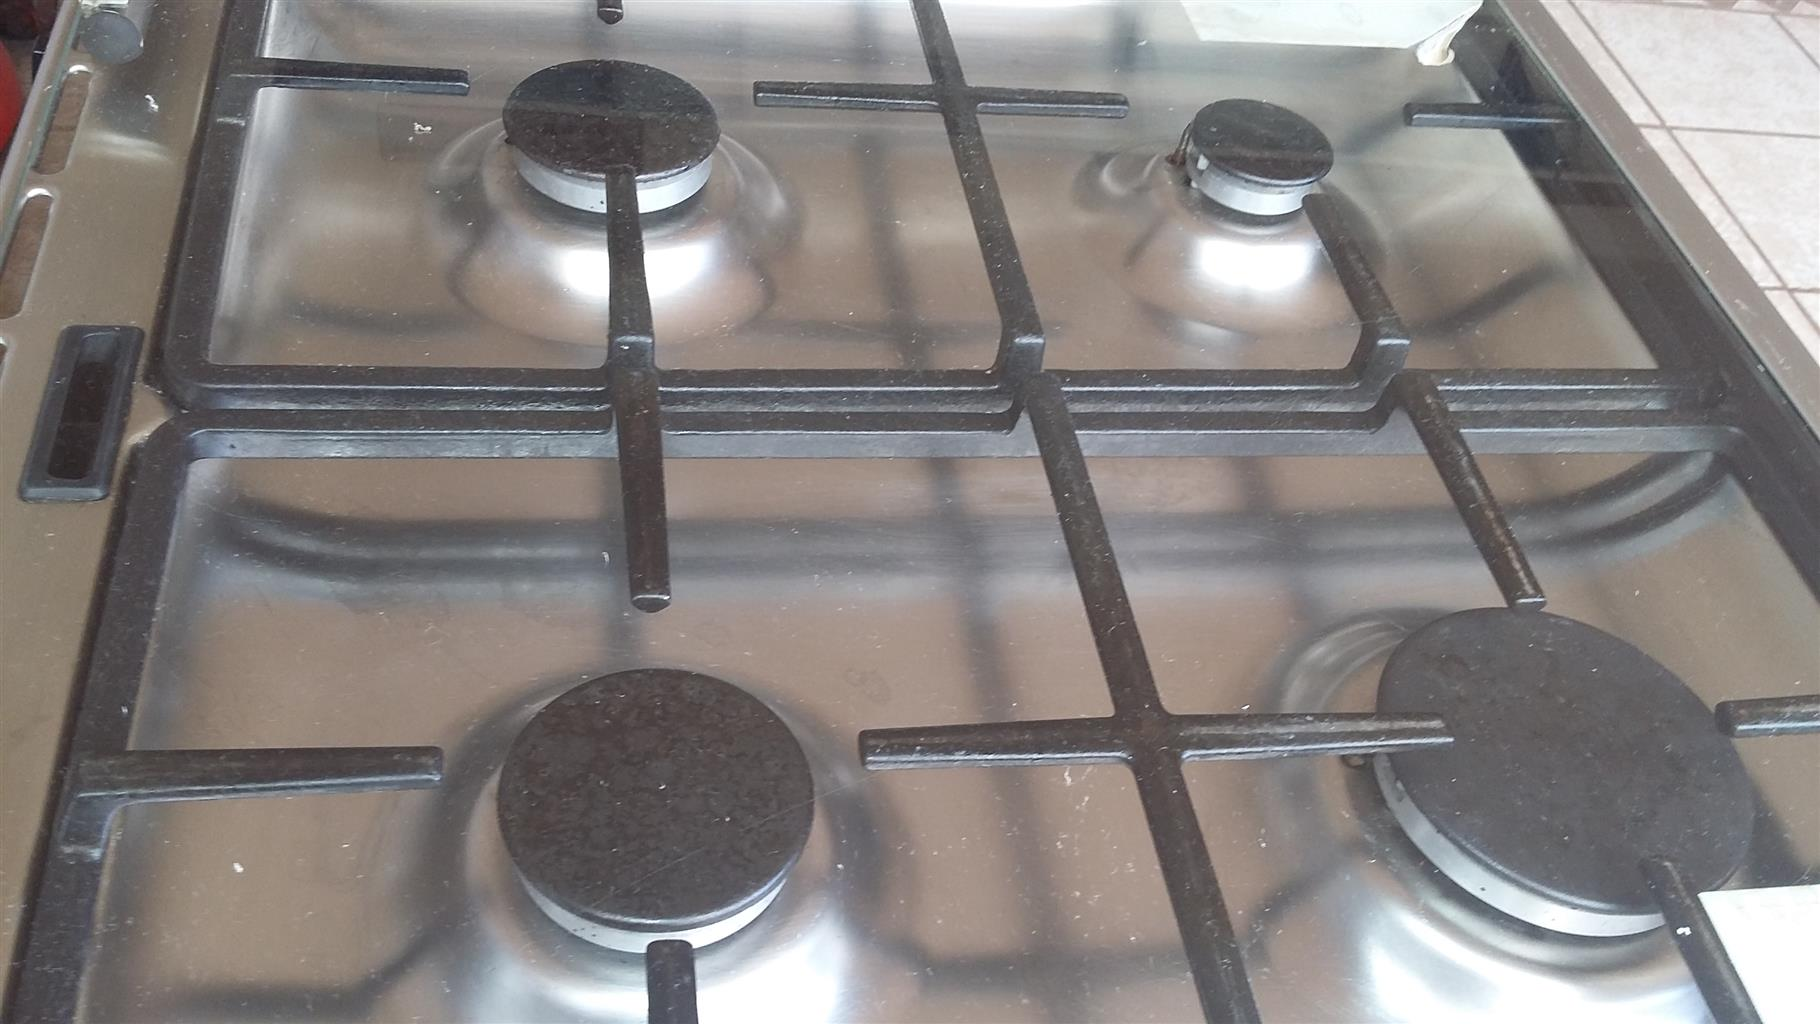 bosch 4 burner gas stove